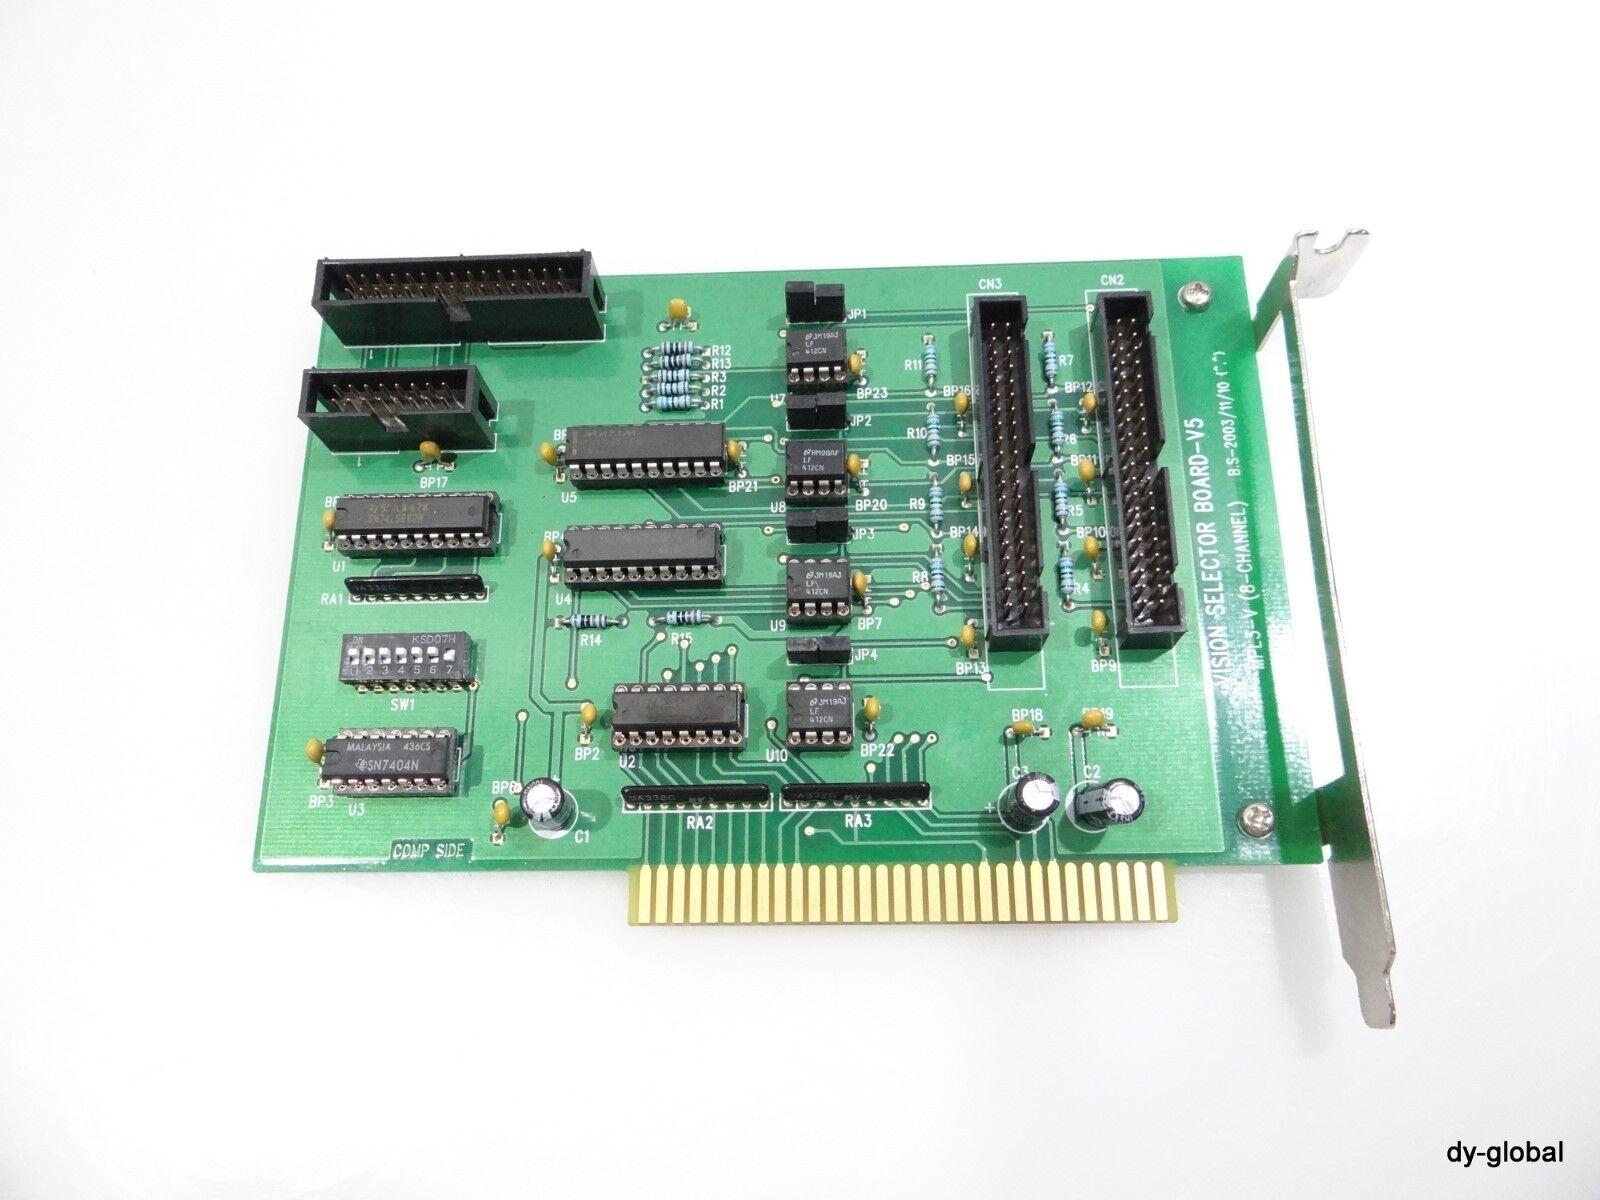 VISION SELECTOR BOARD-V5 MPL3-V (8-CHANNEL) PCB-I-E-259